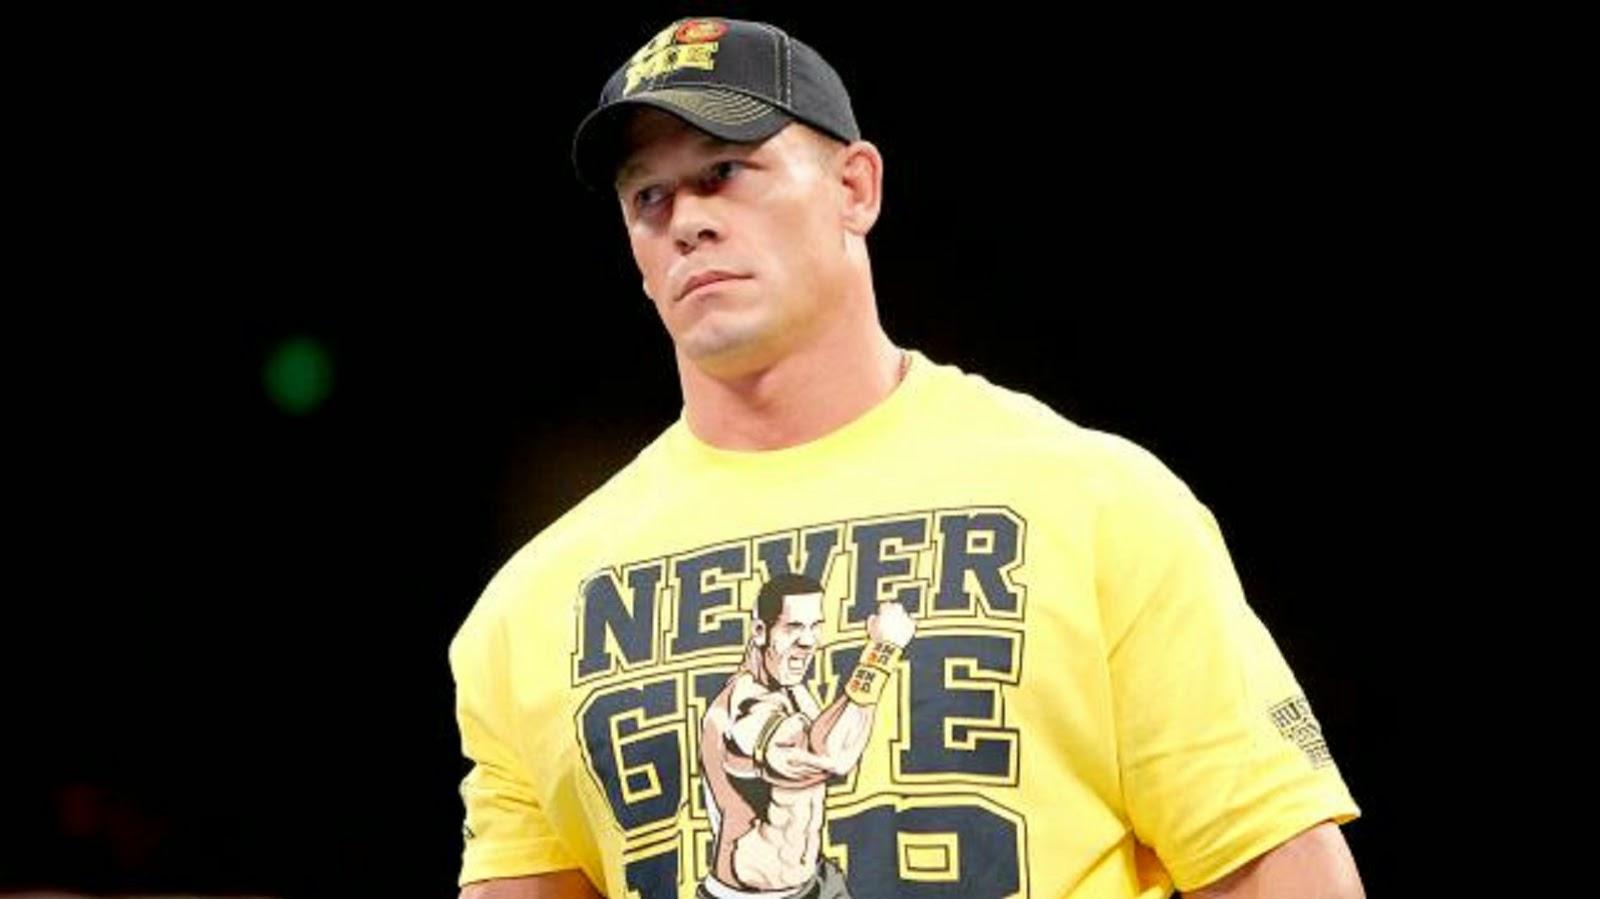 John Cena Hd Wallpapers WWE HD WALLPAPER FREE DOWNLOAD 1600x899